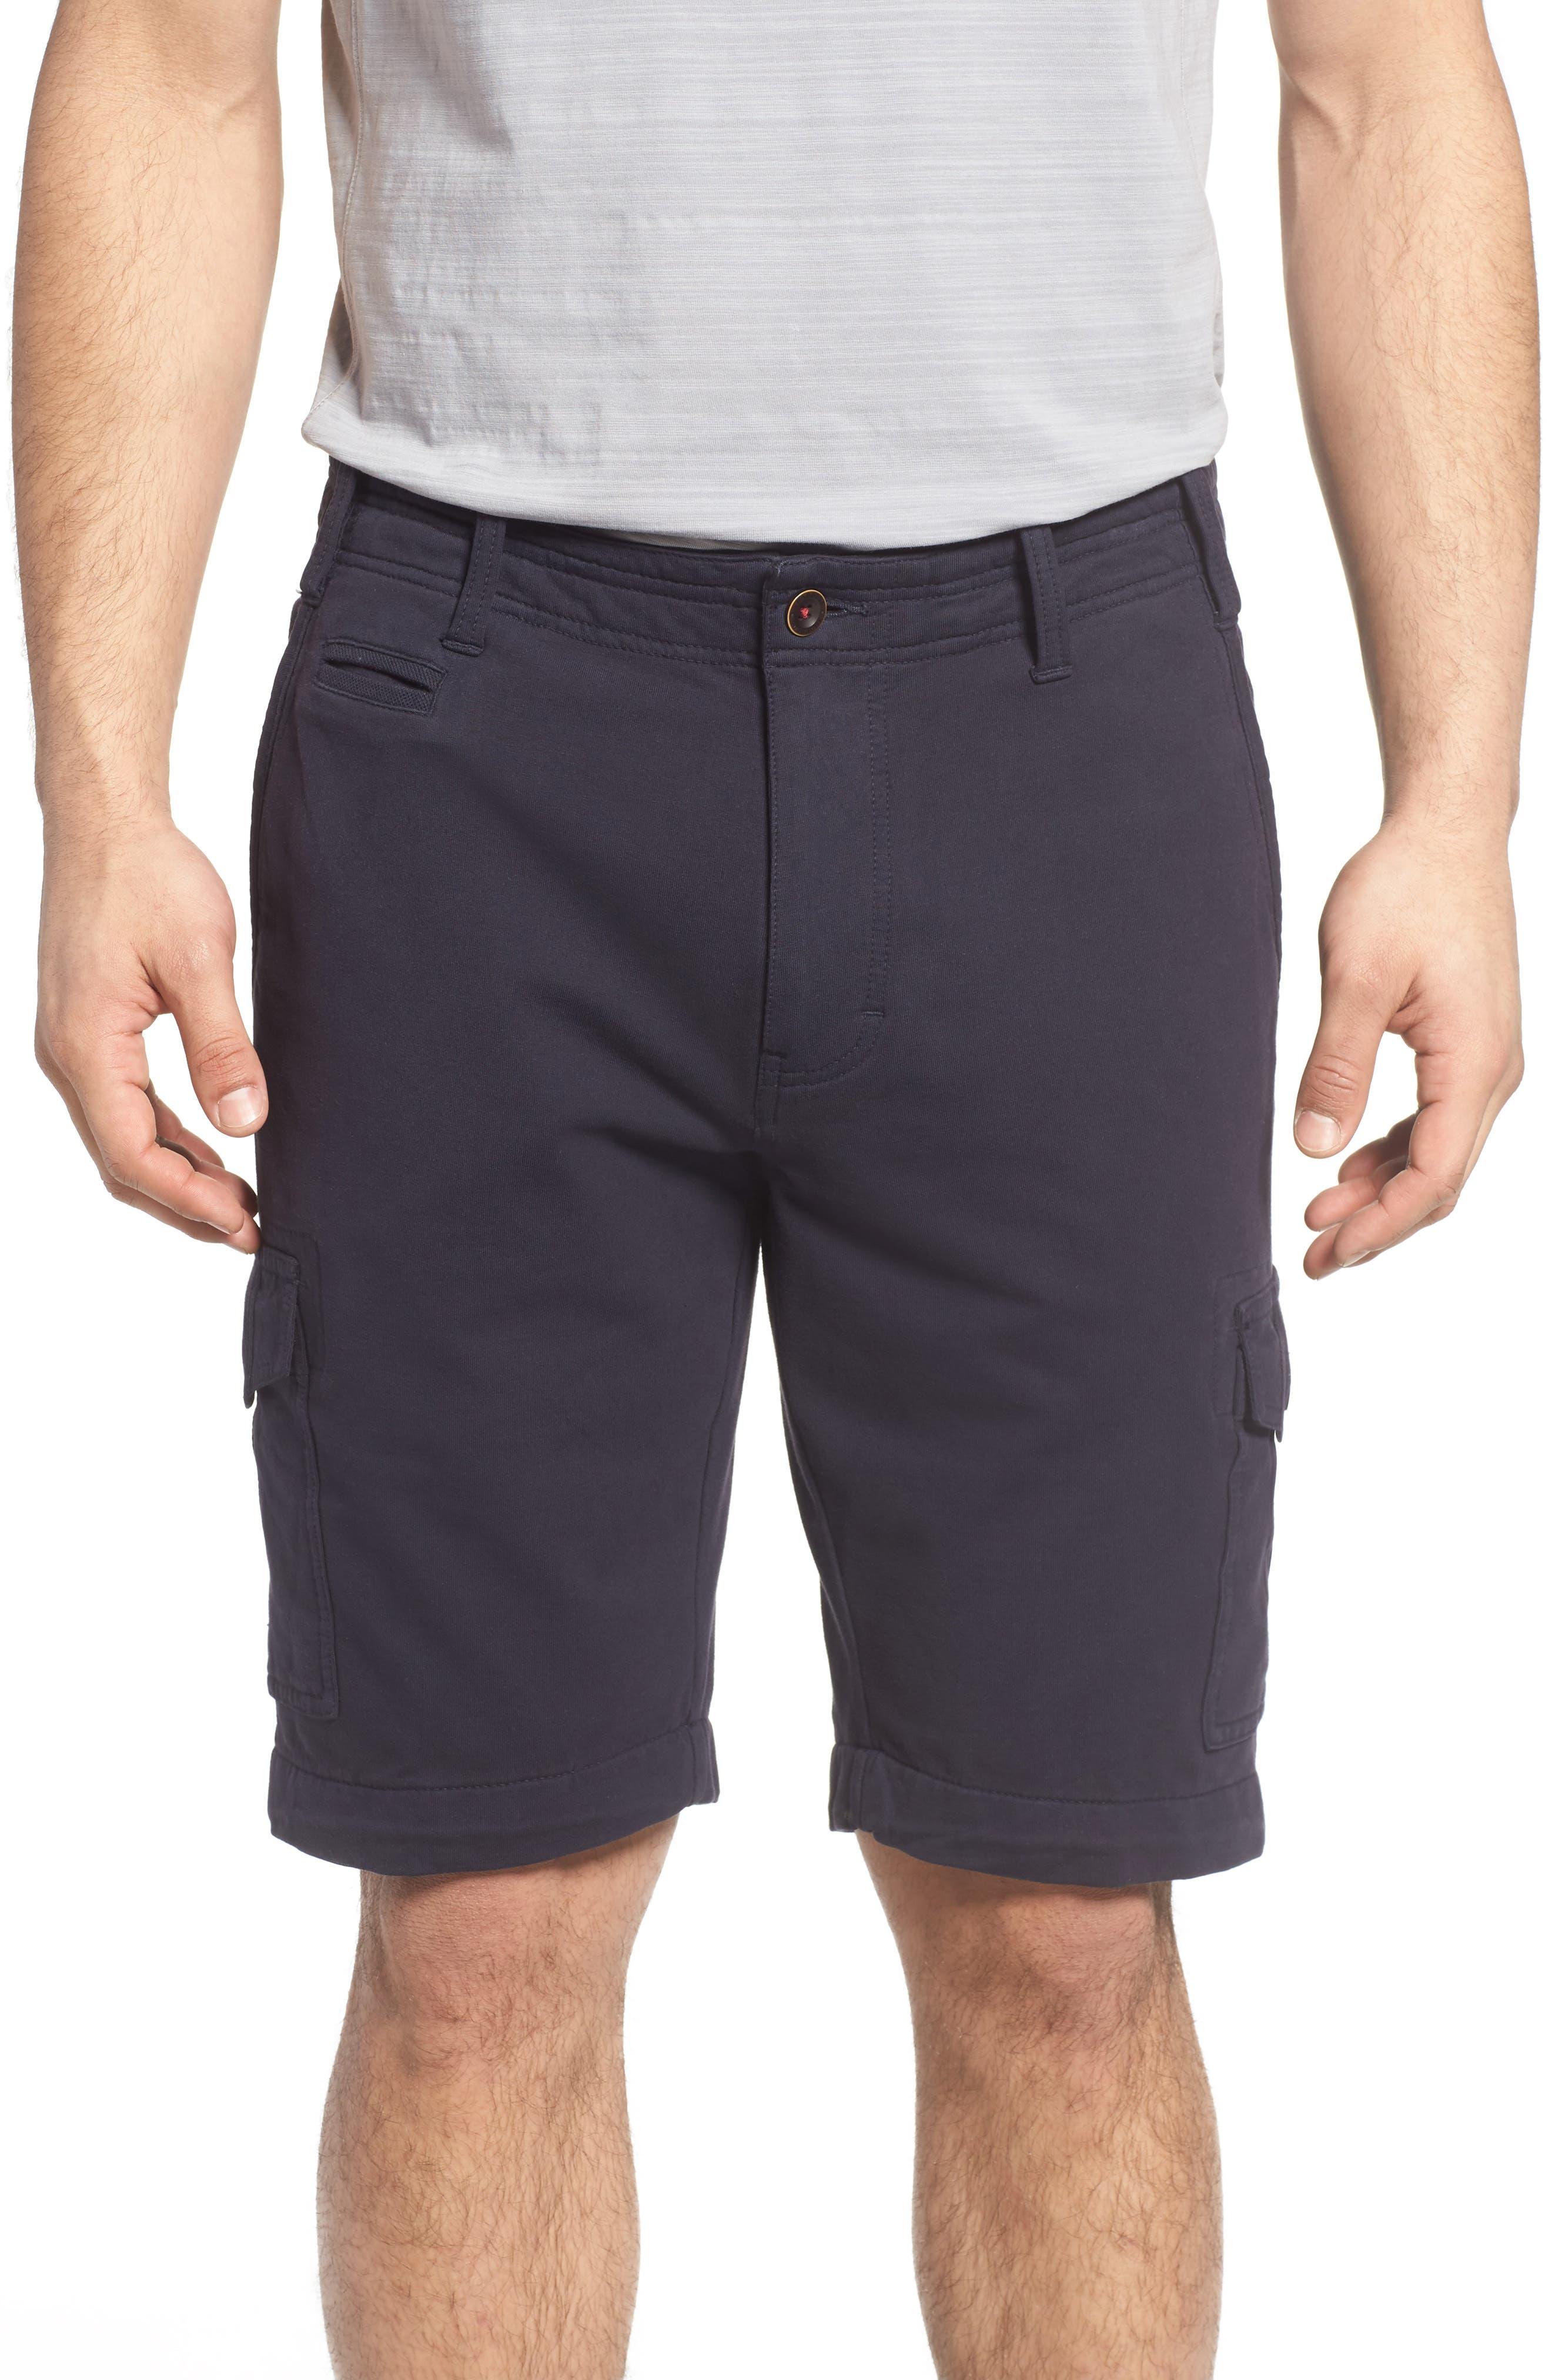 Thaddeus Carlton Knit Cargo Shorts